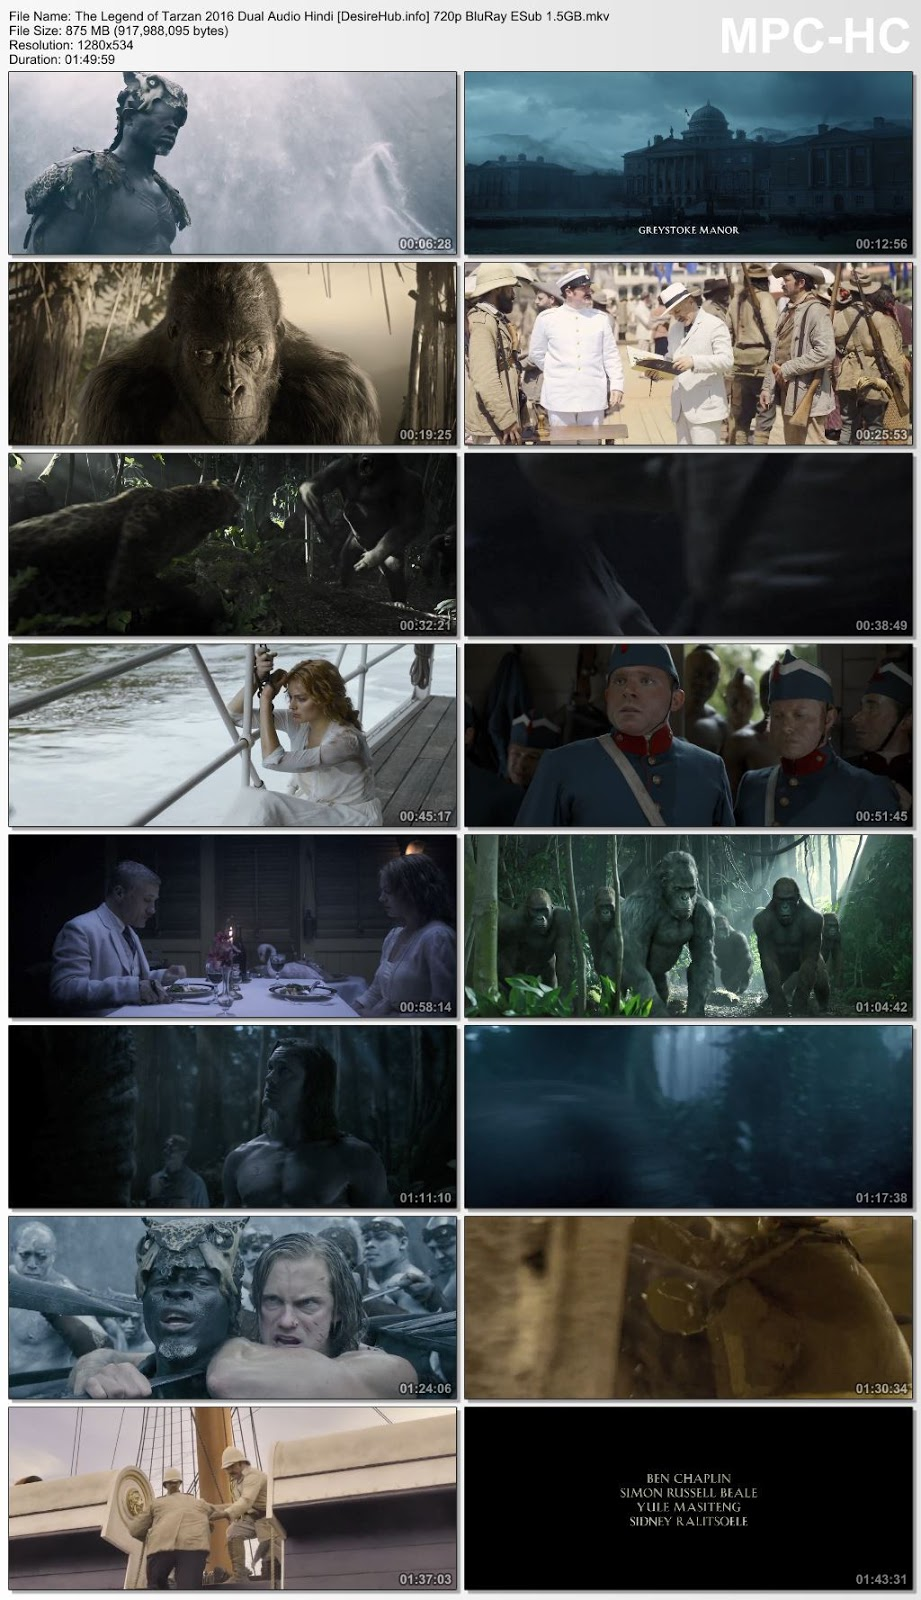 The Legend of Tarzan 2016 Dual Audio Hindi 720p BluRay 850MB Desirehub